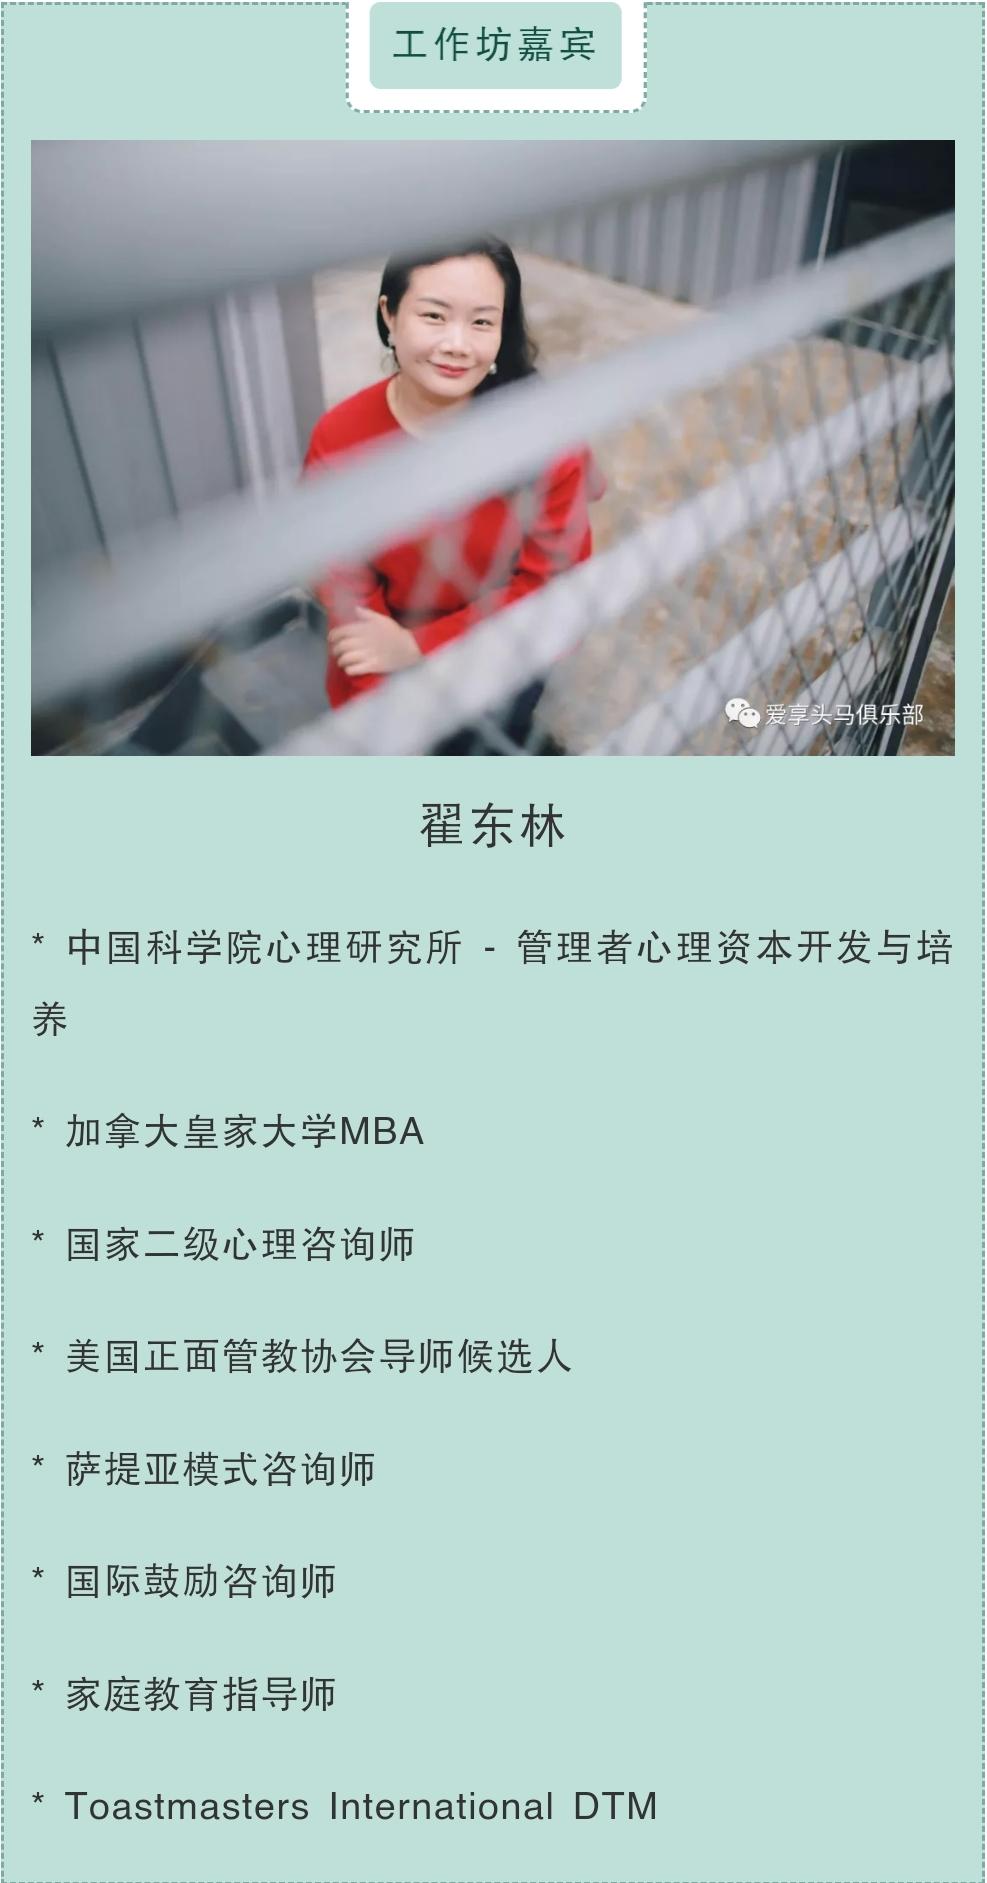 http://www.huodongxing.com/file/20190531/1373437910112/394080463803448.jpg